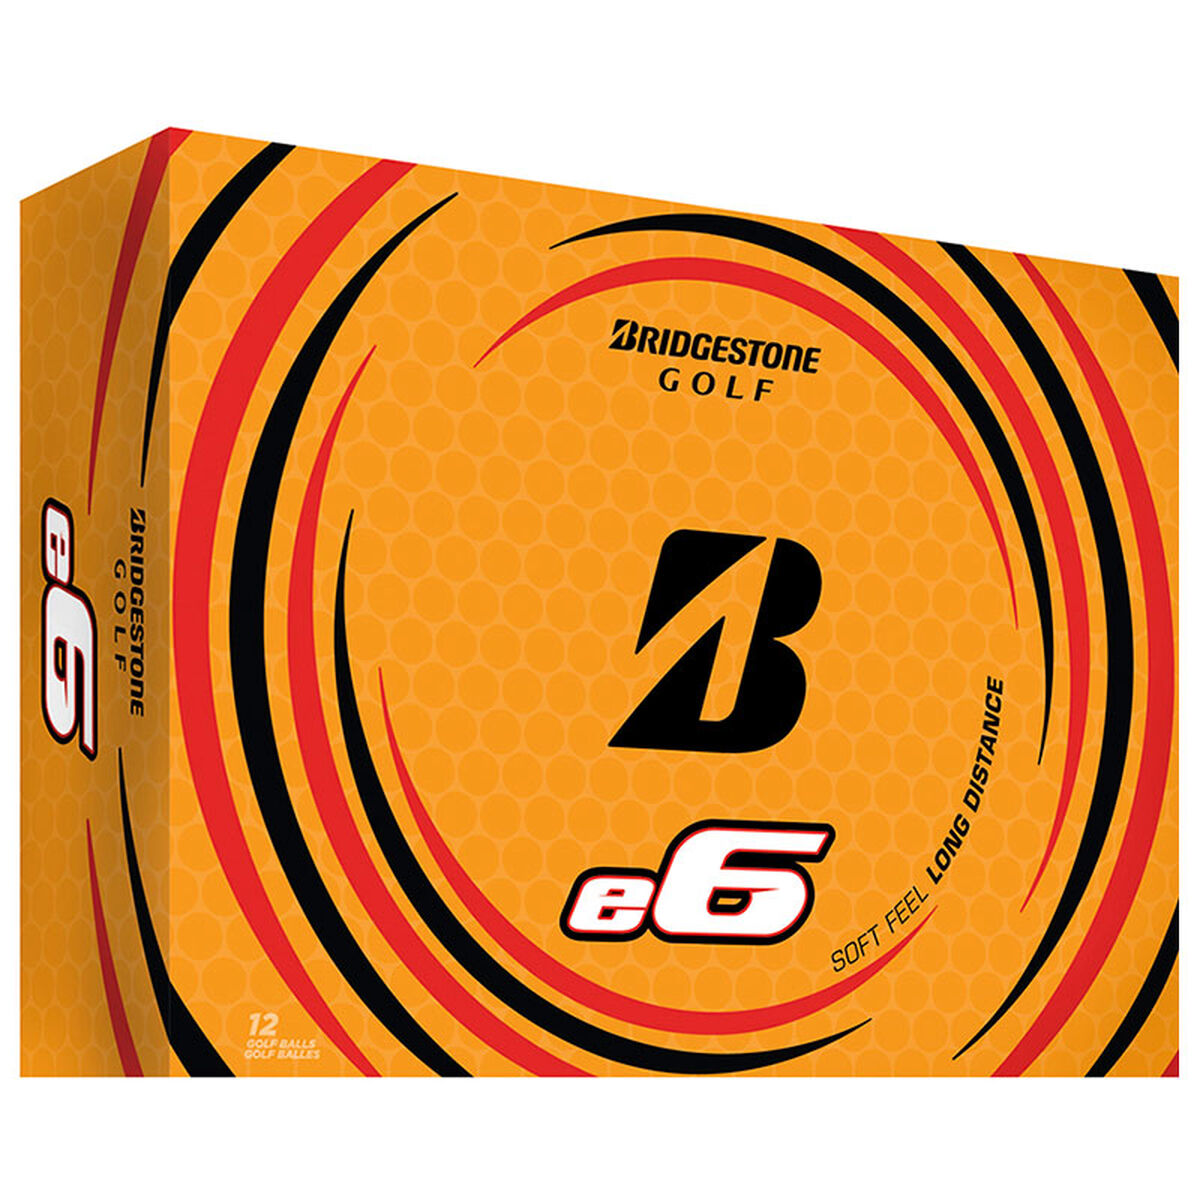 Bridgestone Golf e6 12 Ball Pack, Male, White, One Size | American Golf